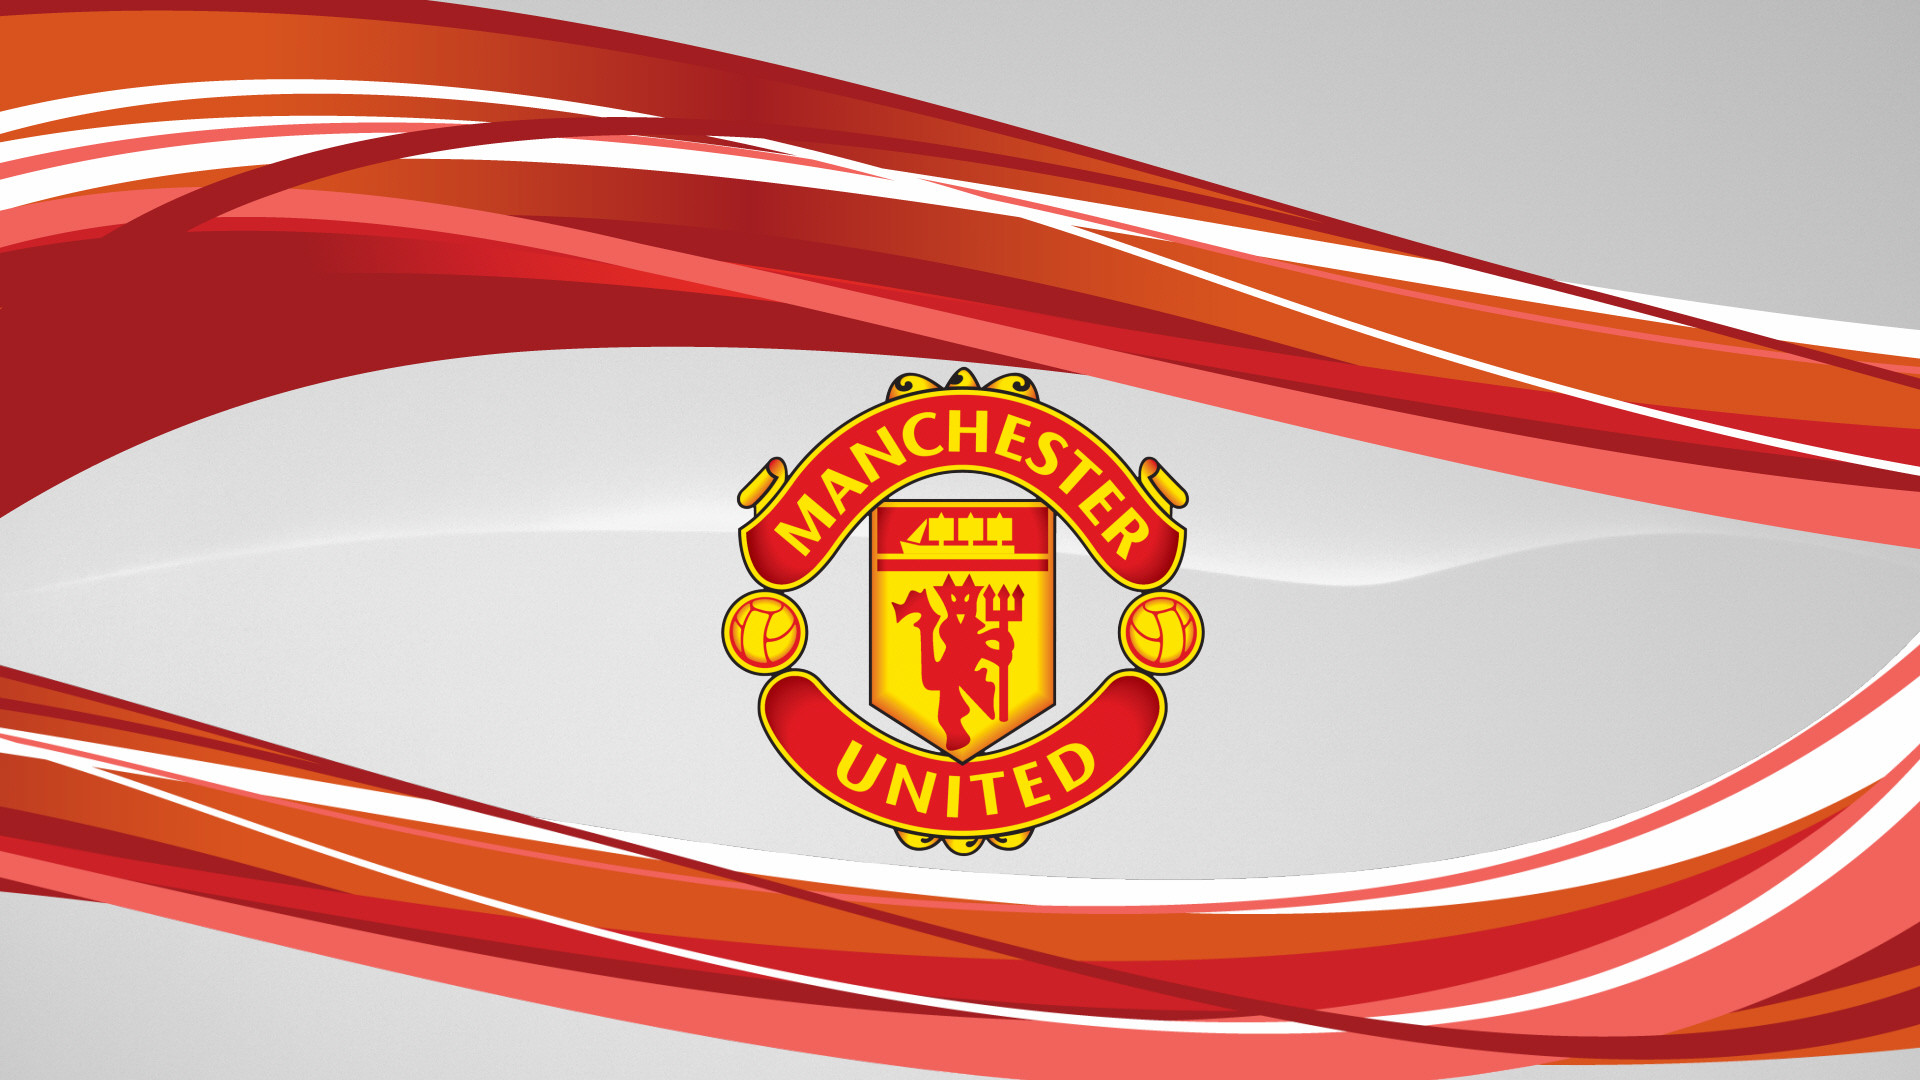 Manchester-United-Logo-High-Def-Desktop-Wallpaper ·  ryan_giggs_manchester_united_football_great_94157_3840x2400